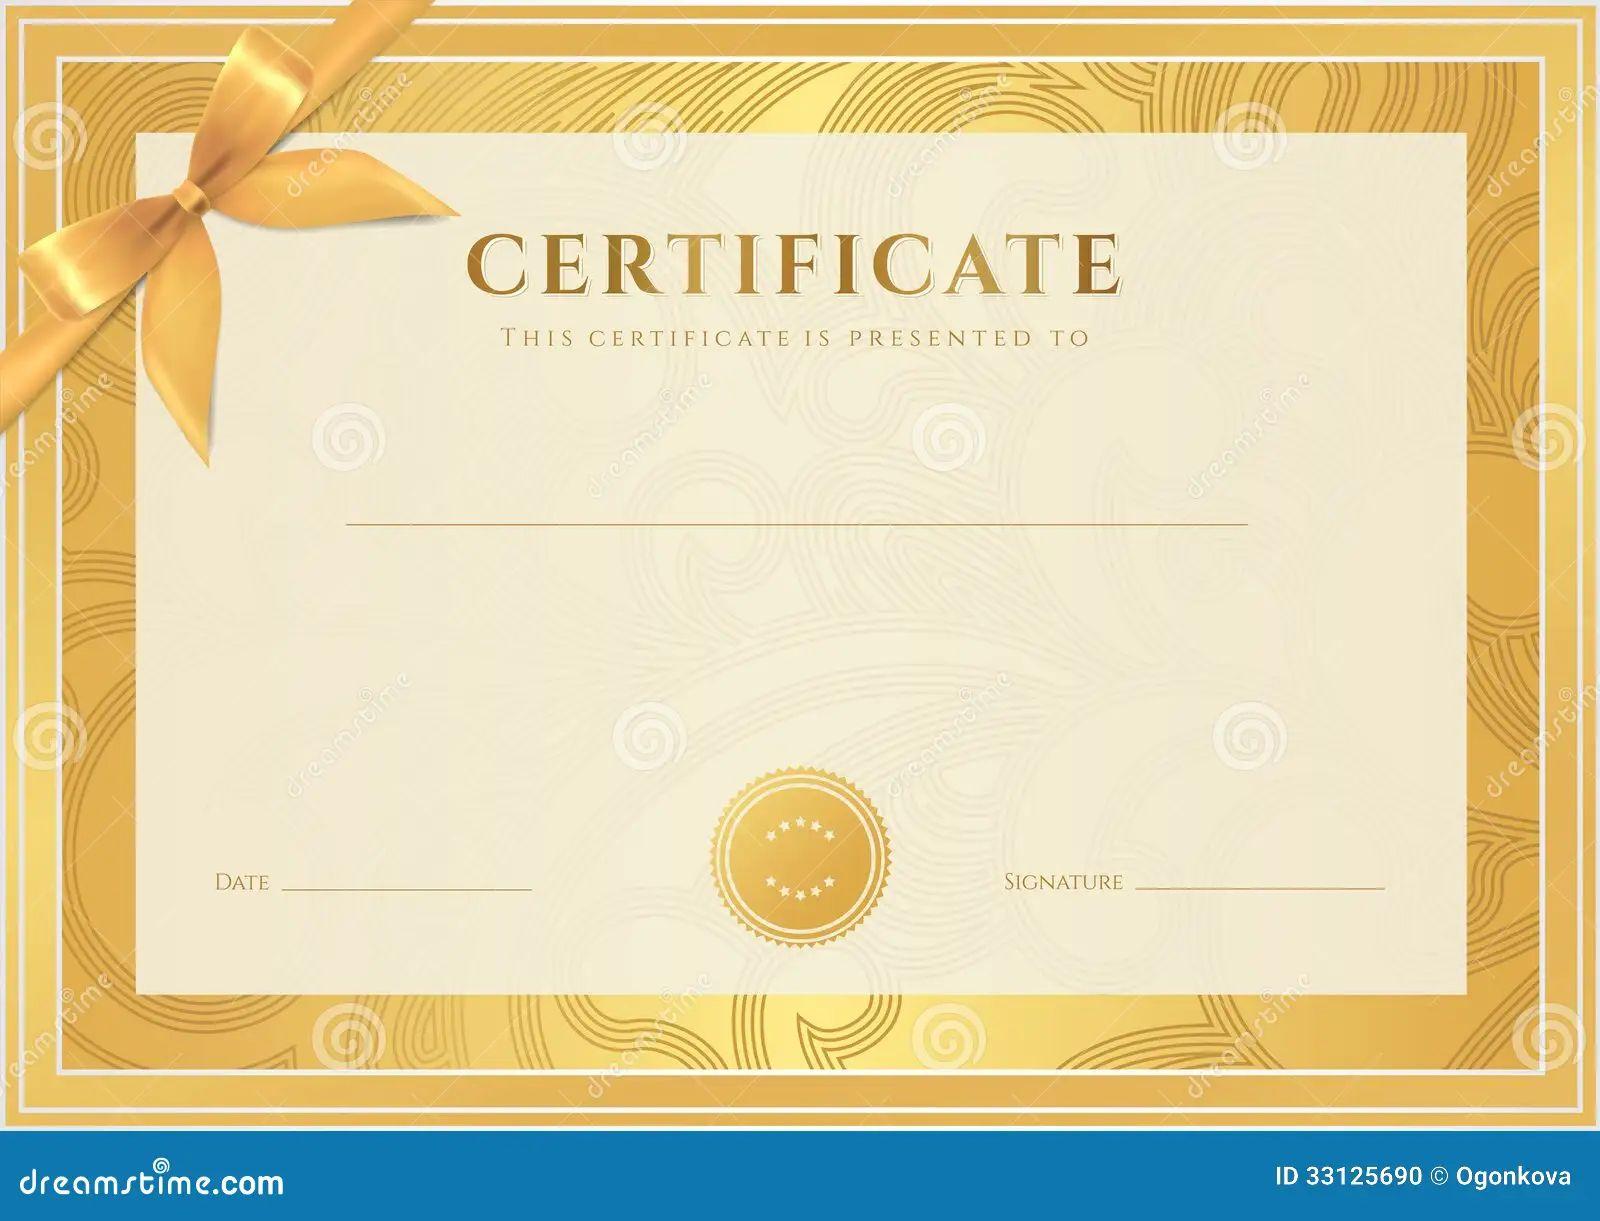 free blank certificates templates